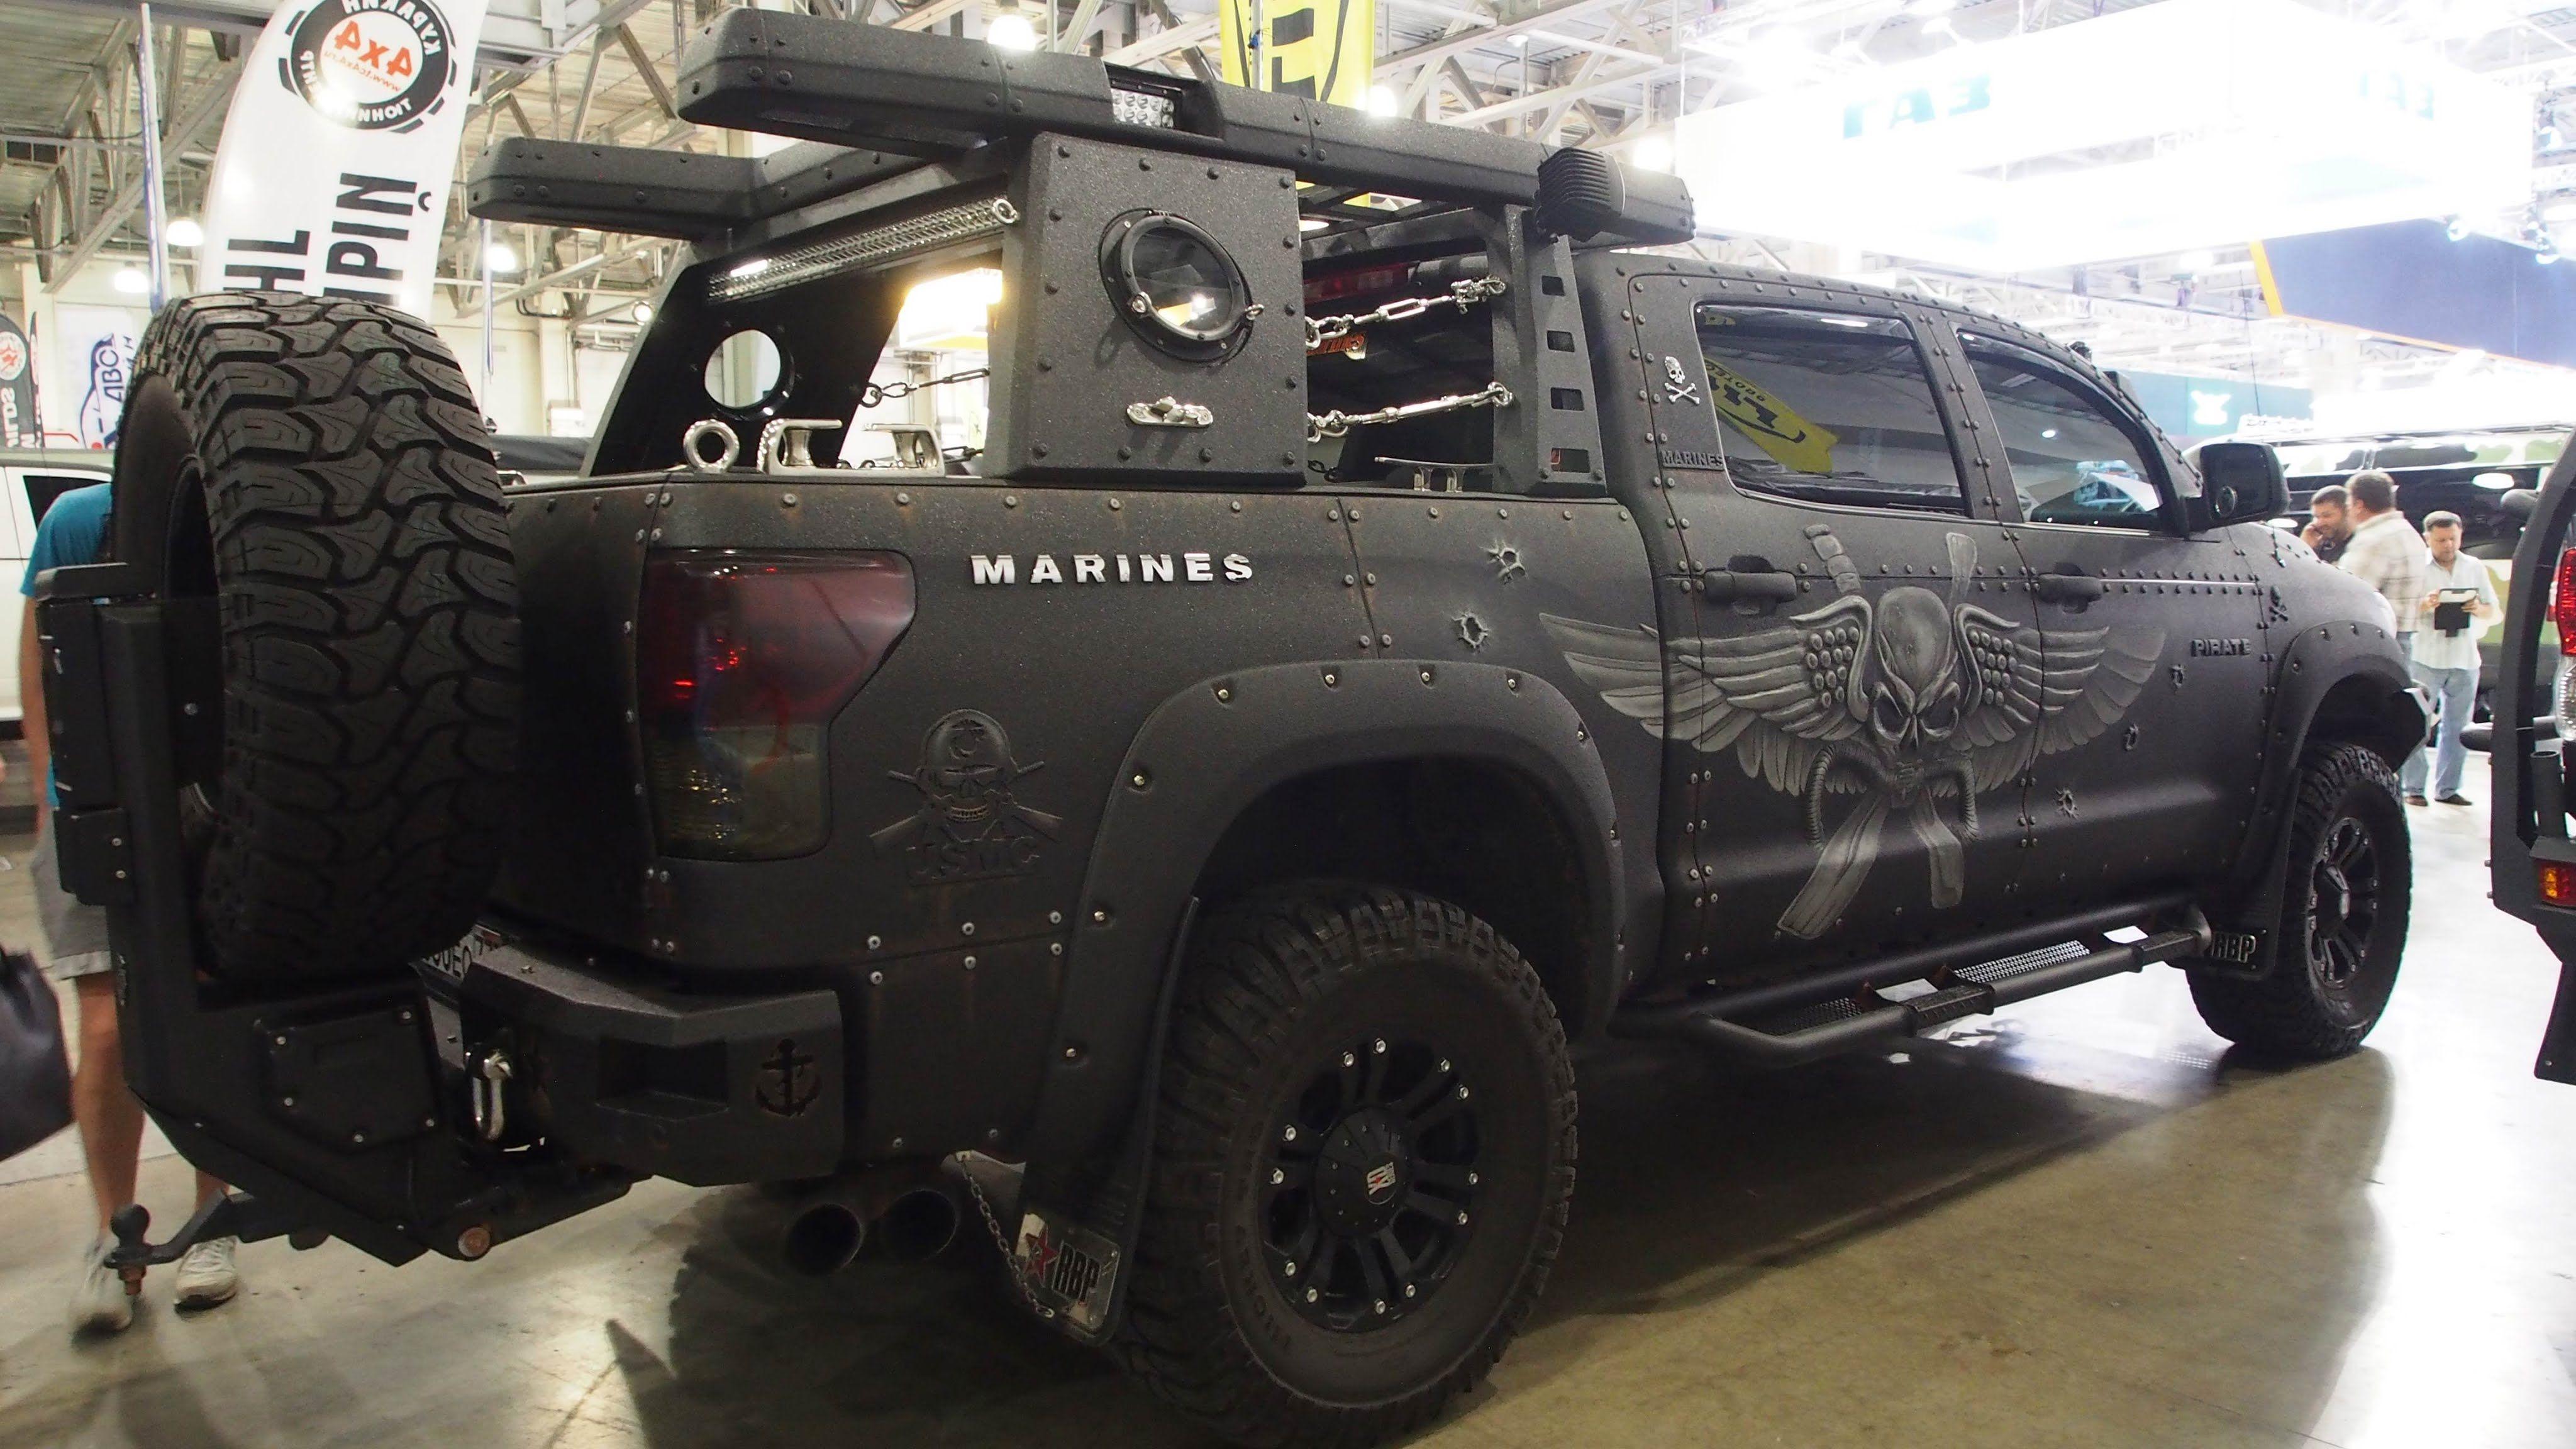 toyota tundra crewmax cab pirat marines offroad tuning moscow rh pinterest com